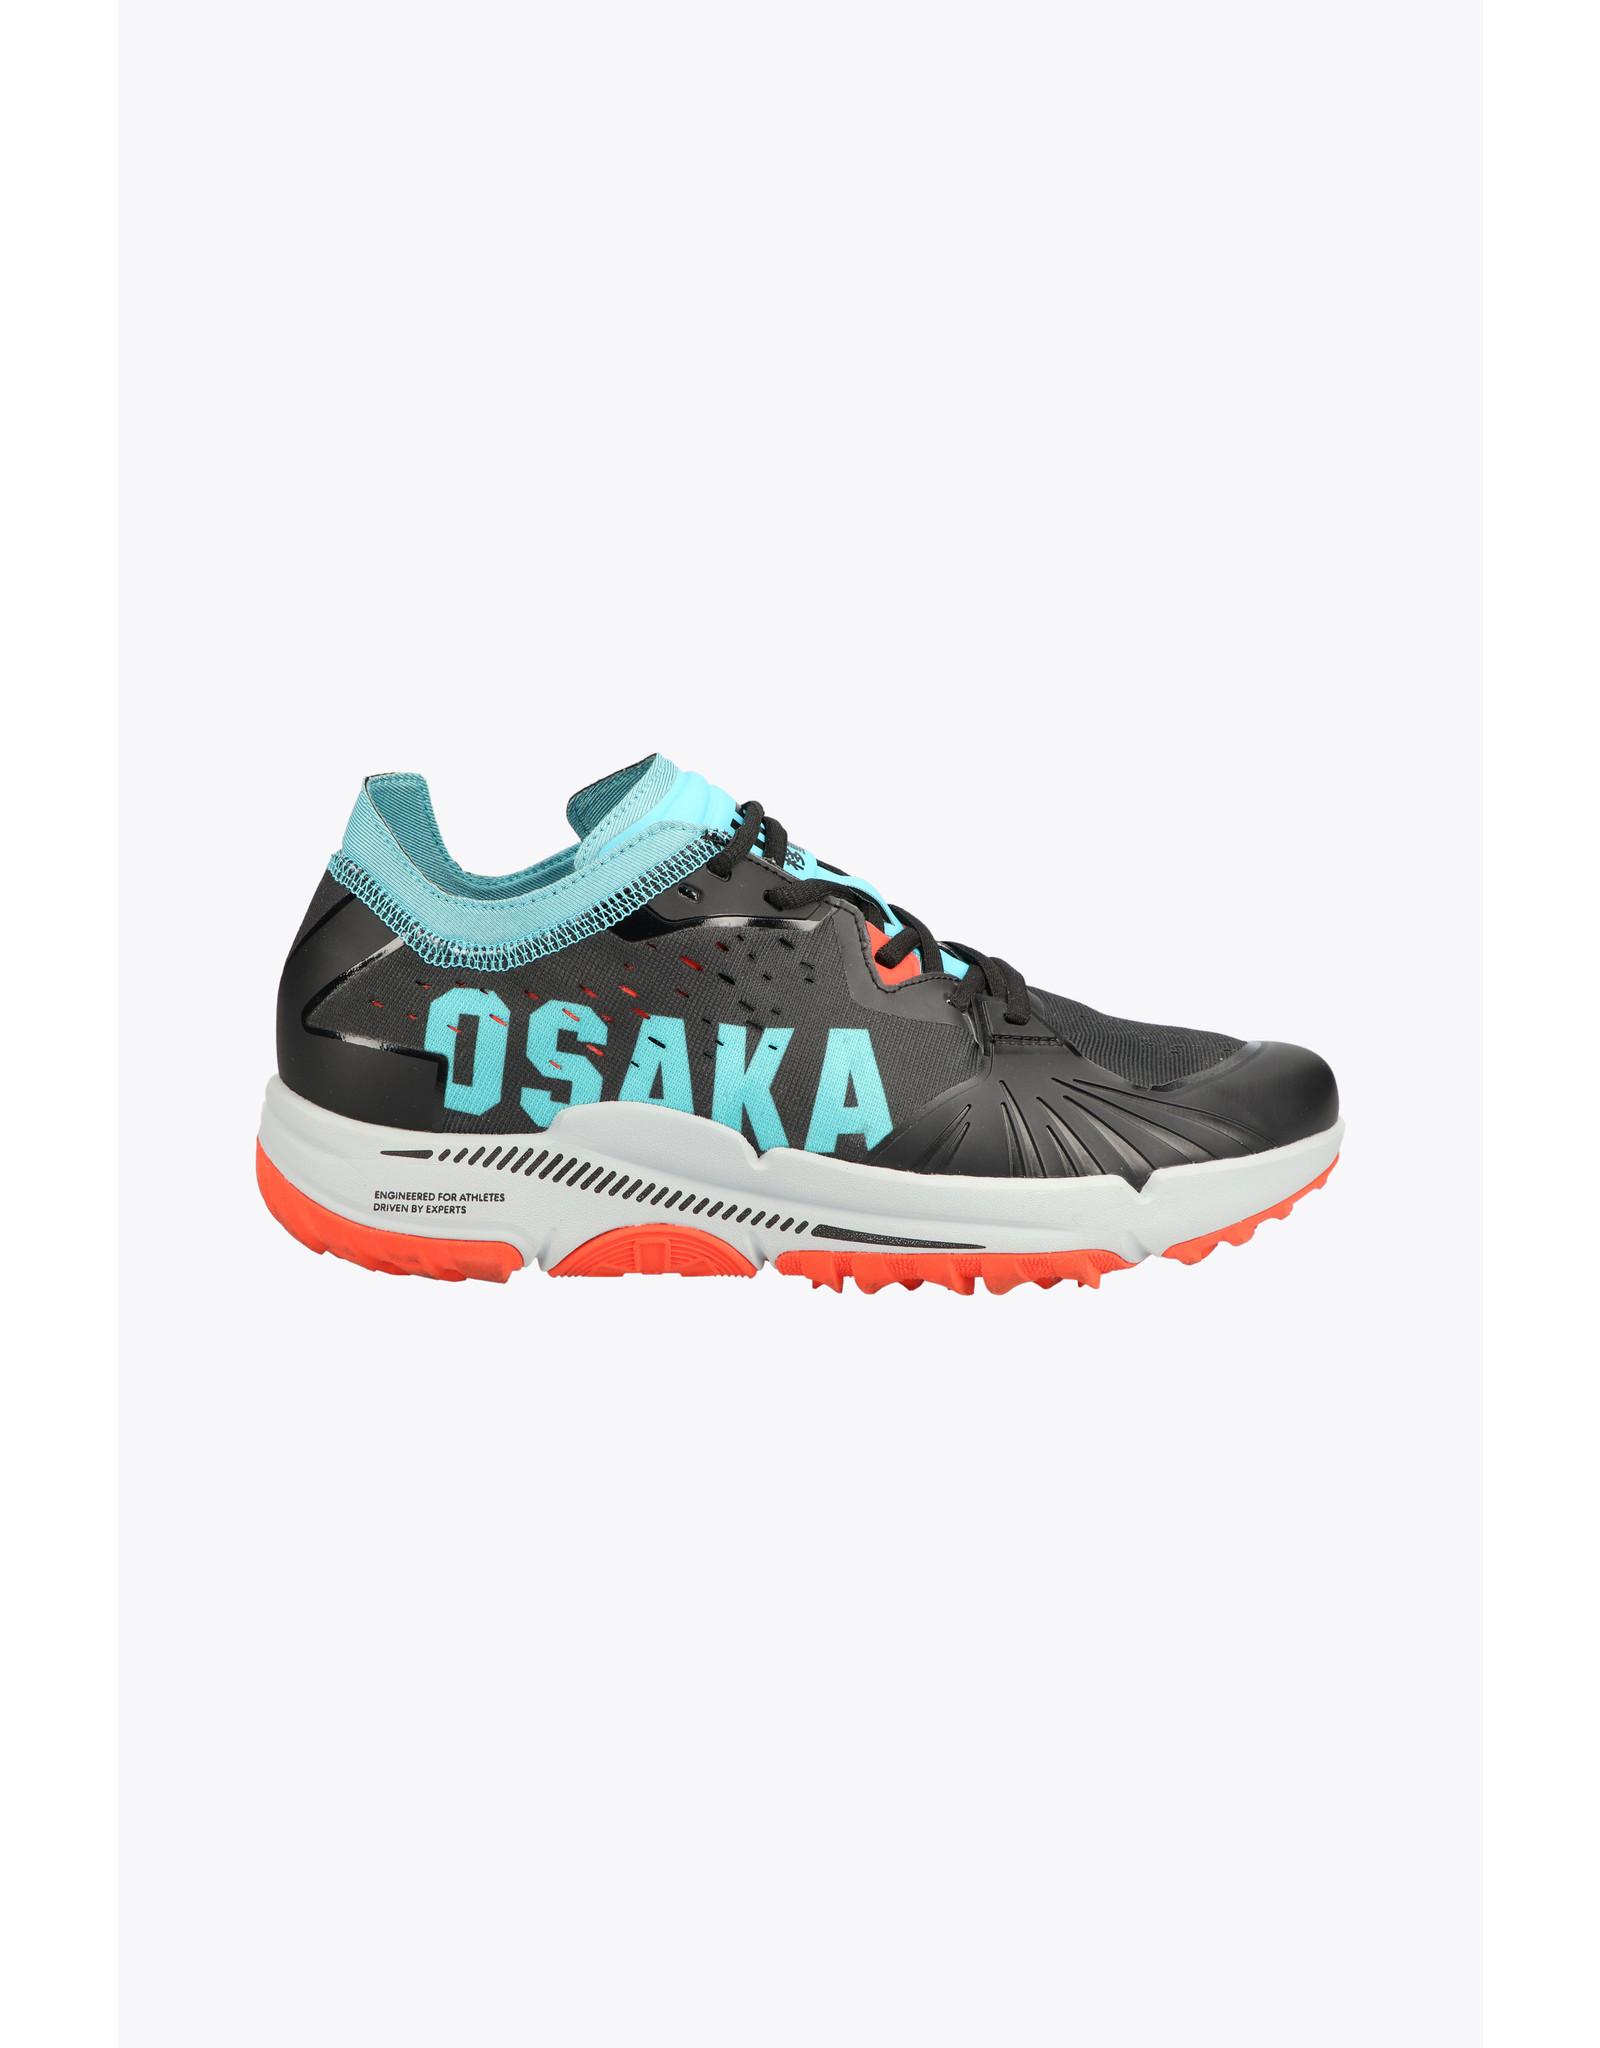 Osaka OSAKA IDO MK1 SLIM - ANALOG BLACK/AQUA BLUE